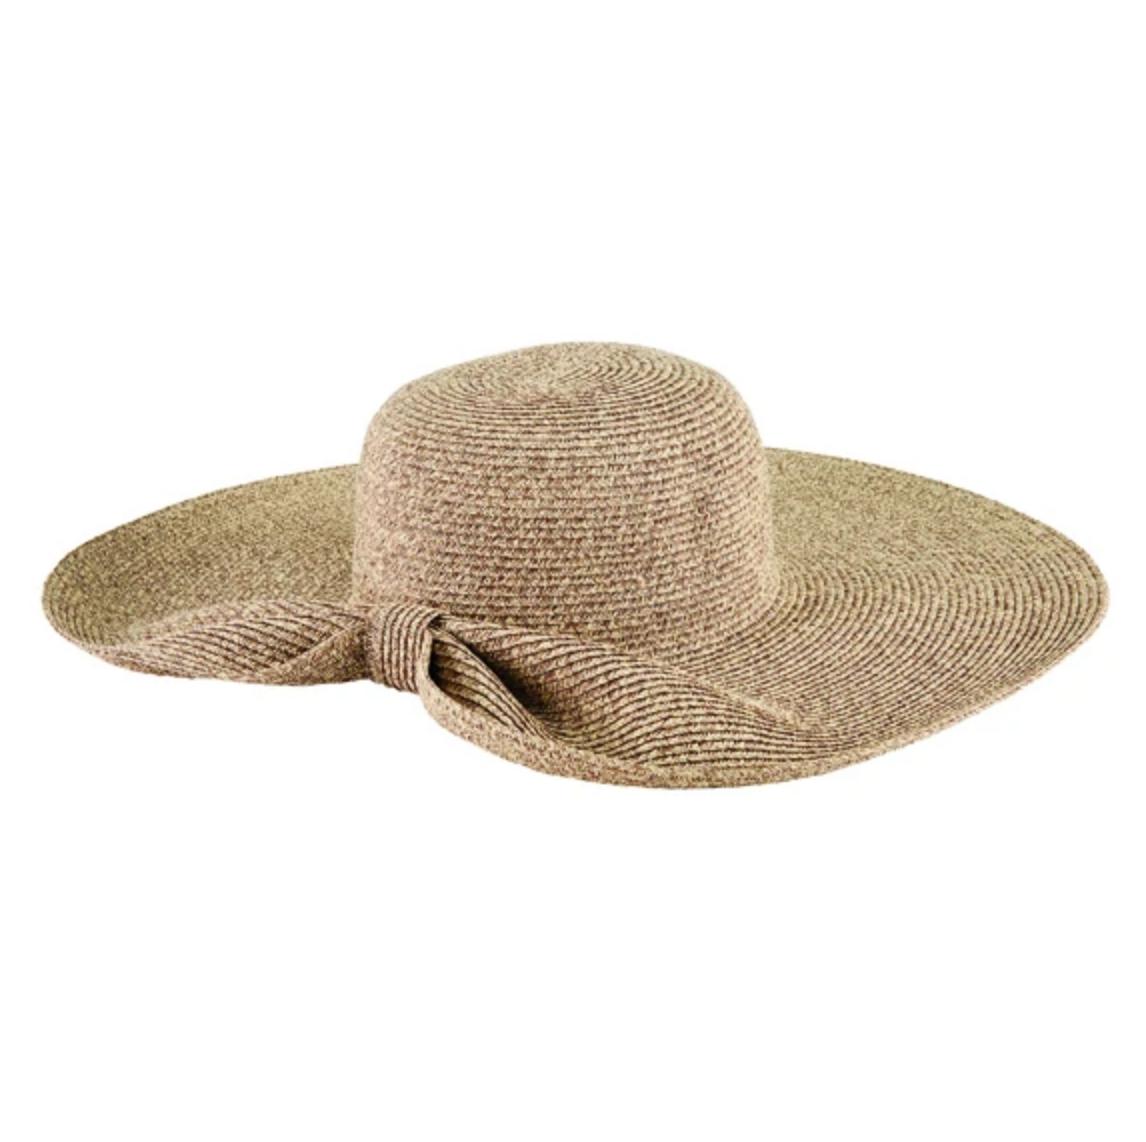 Floppy Ultrabraid Hat - Gathered Back - Natural